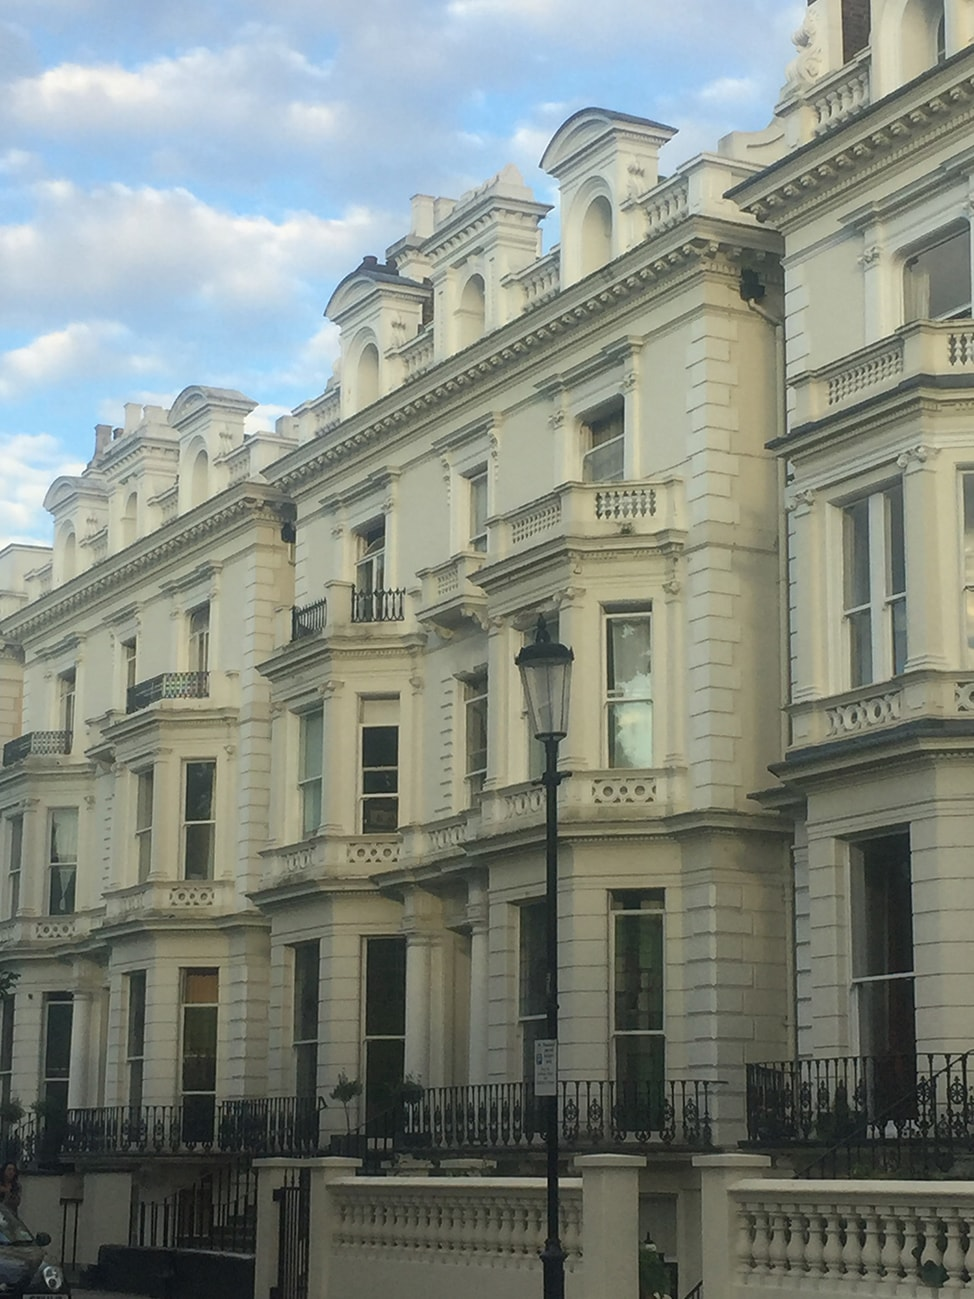 While London row houses